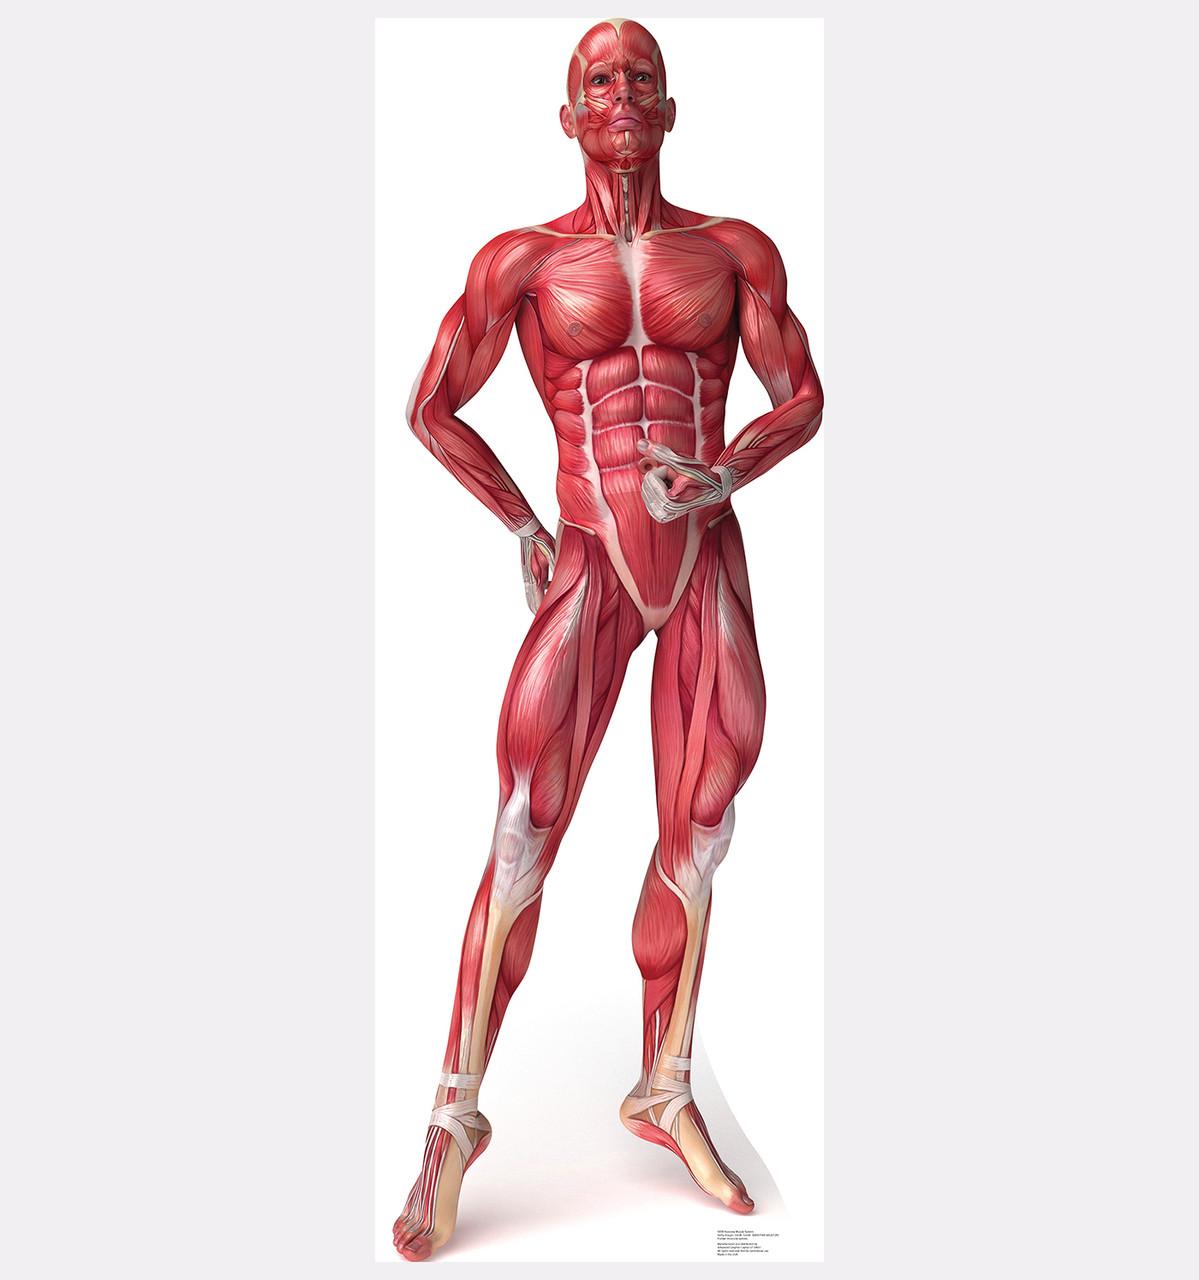 Life Size Muscle System Anatomy Cardboard Standup Cardboard Cutout